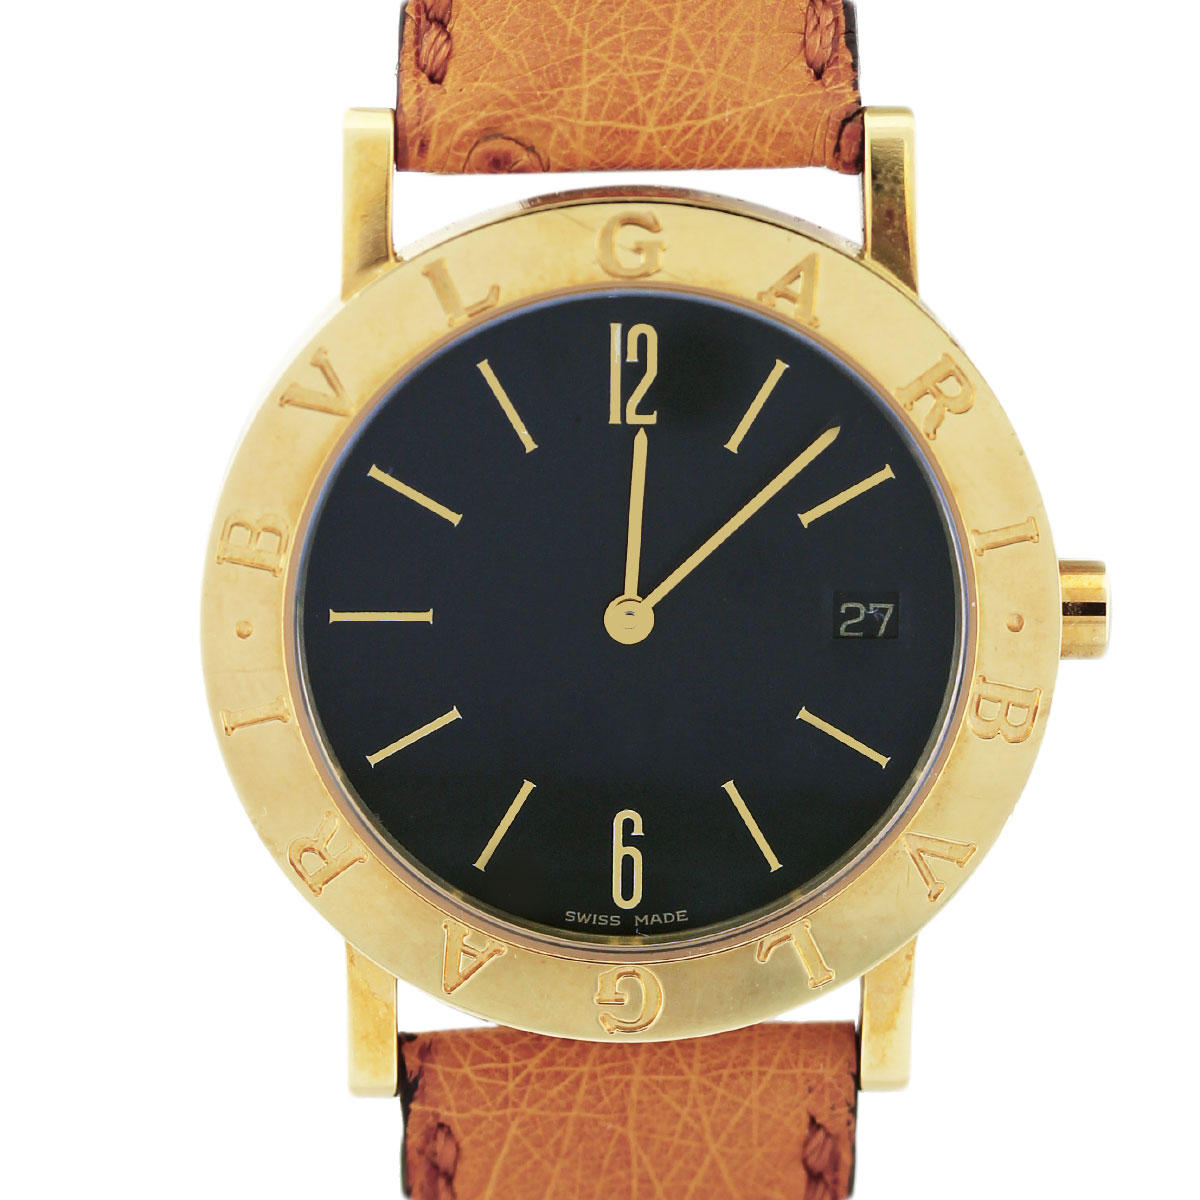 Bvlgari Bulgari BB 33 Gl Automatic Yellow Gold Mens Watch